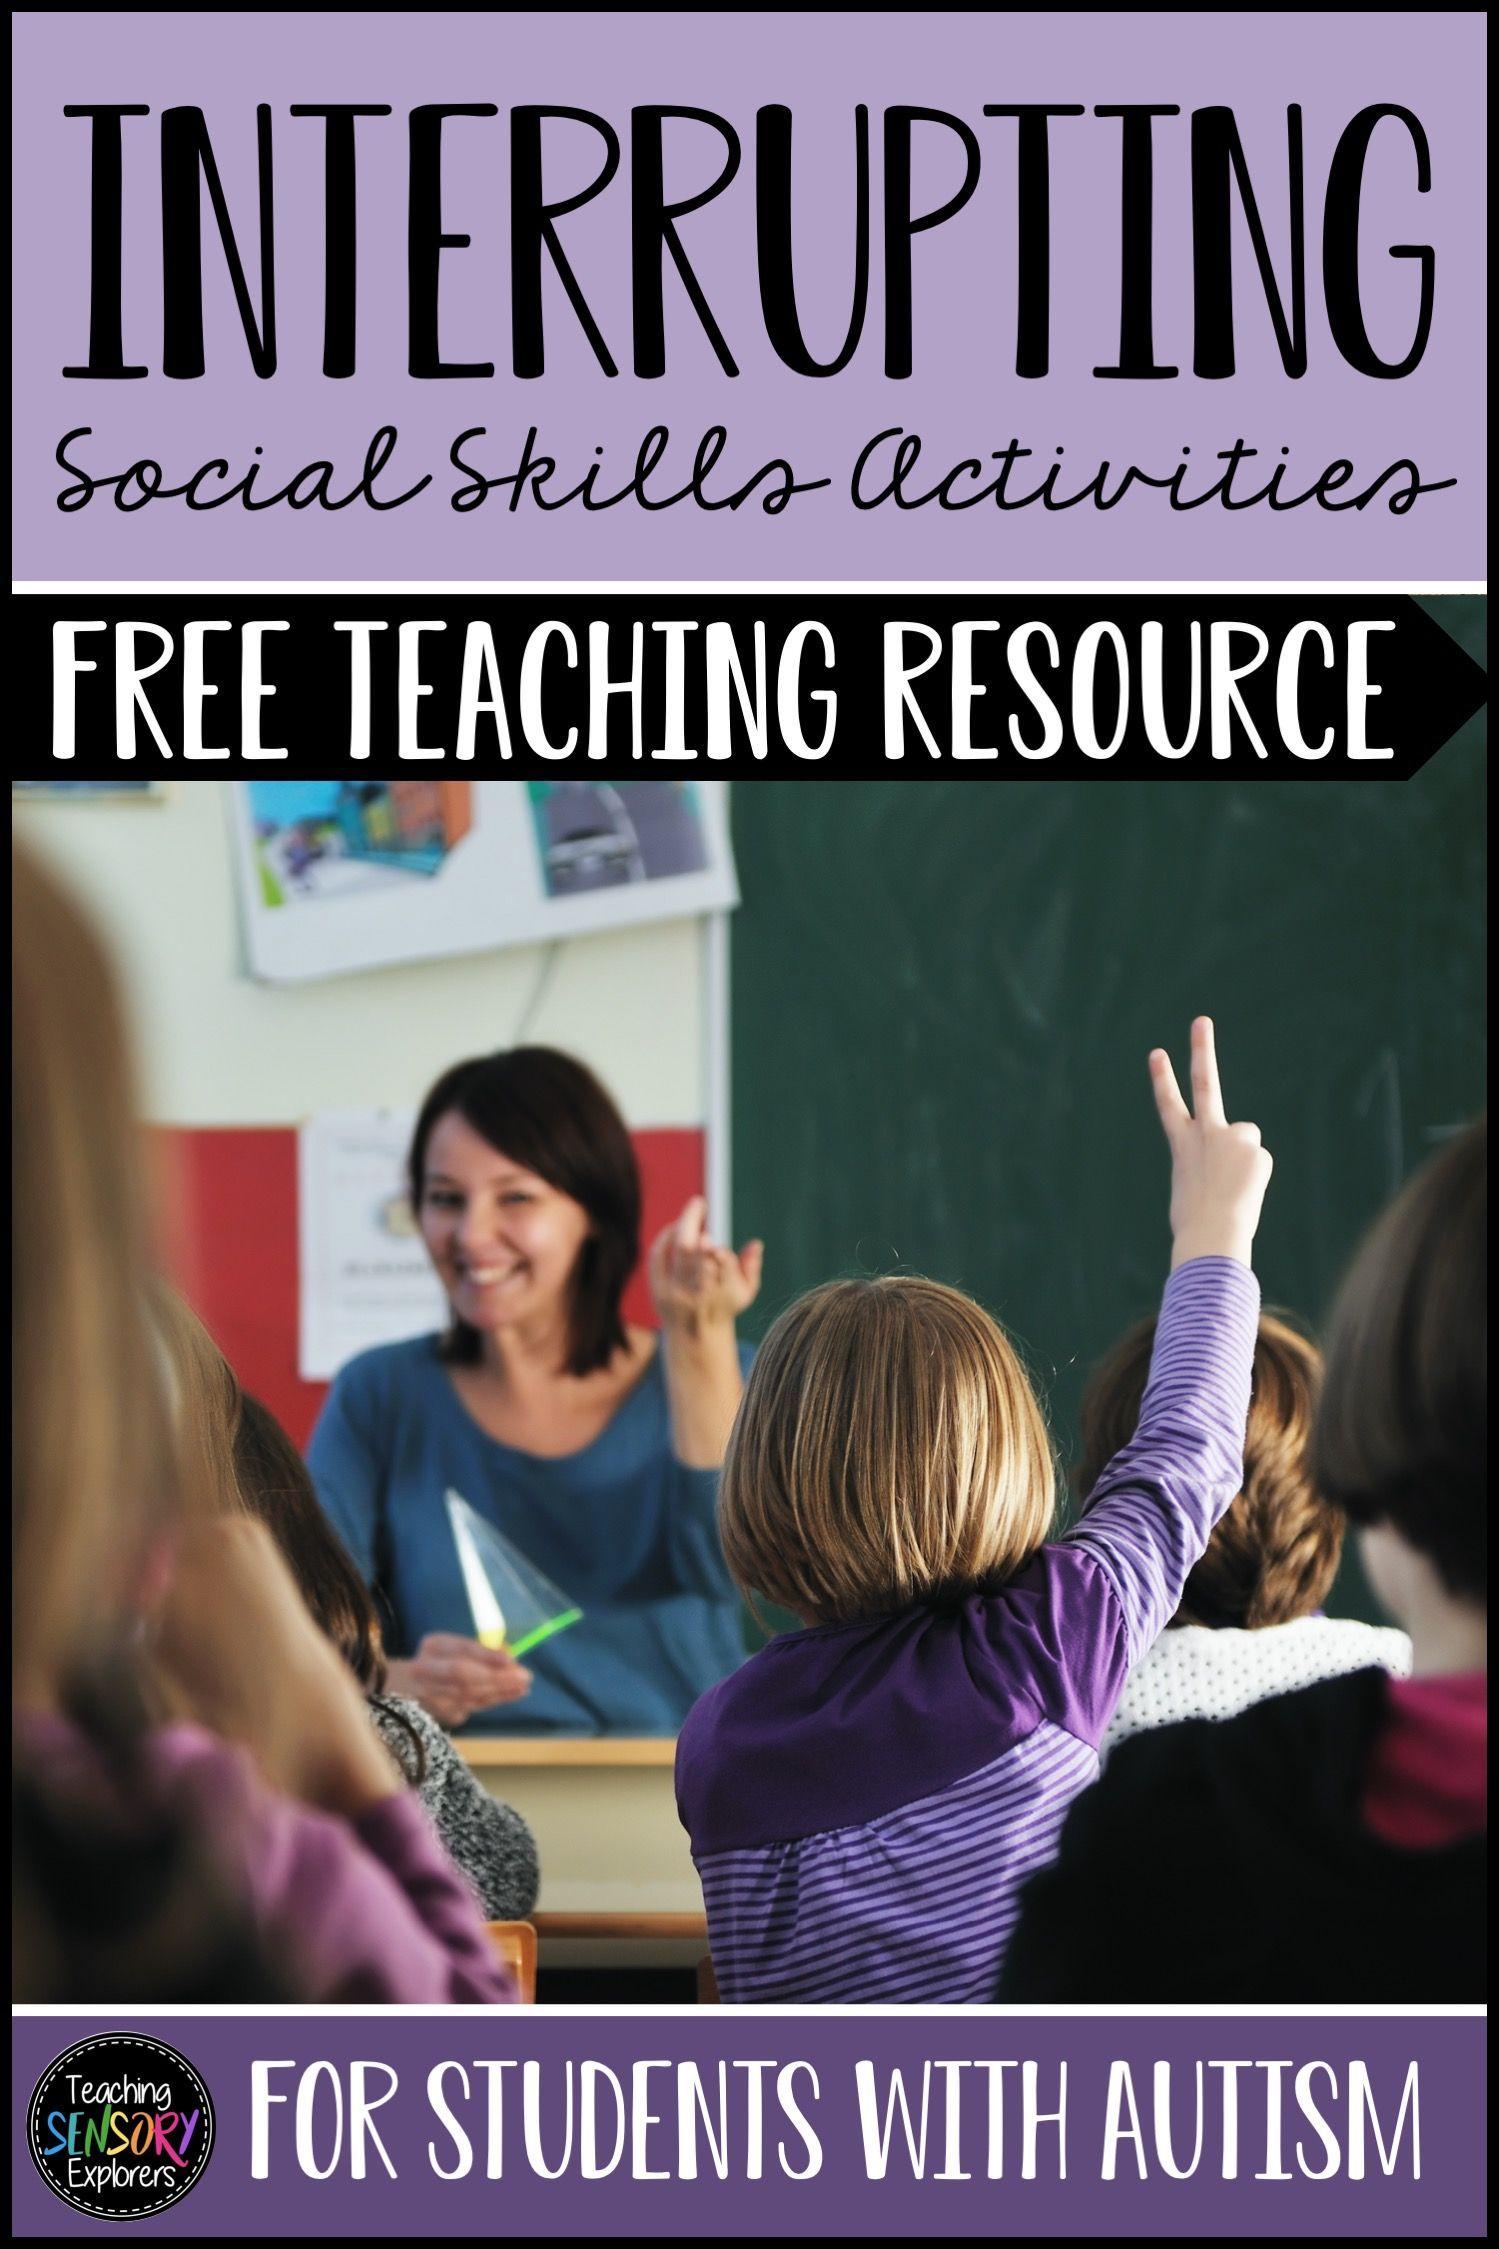 Interrupting Social Skills Worksheet Activity And Social